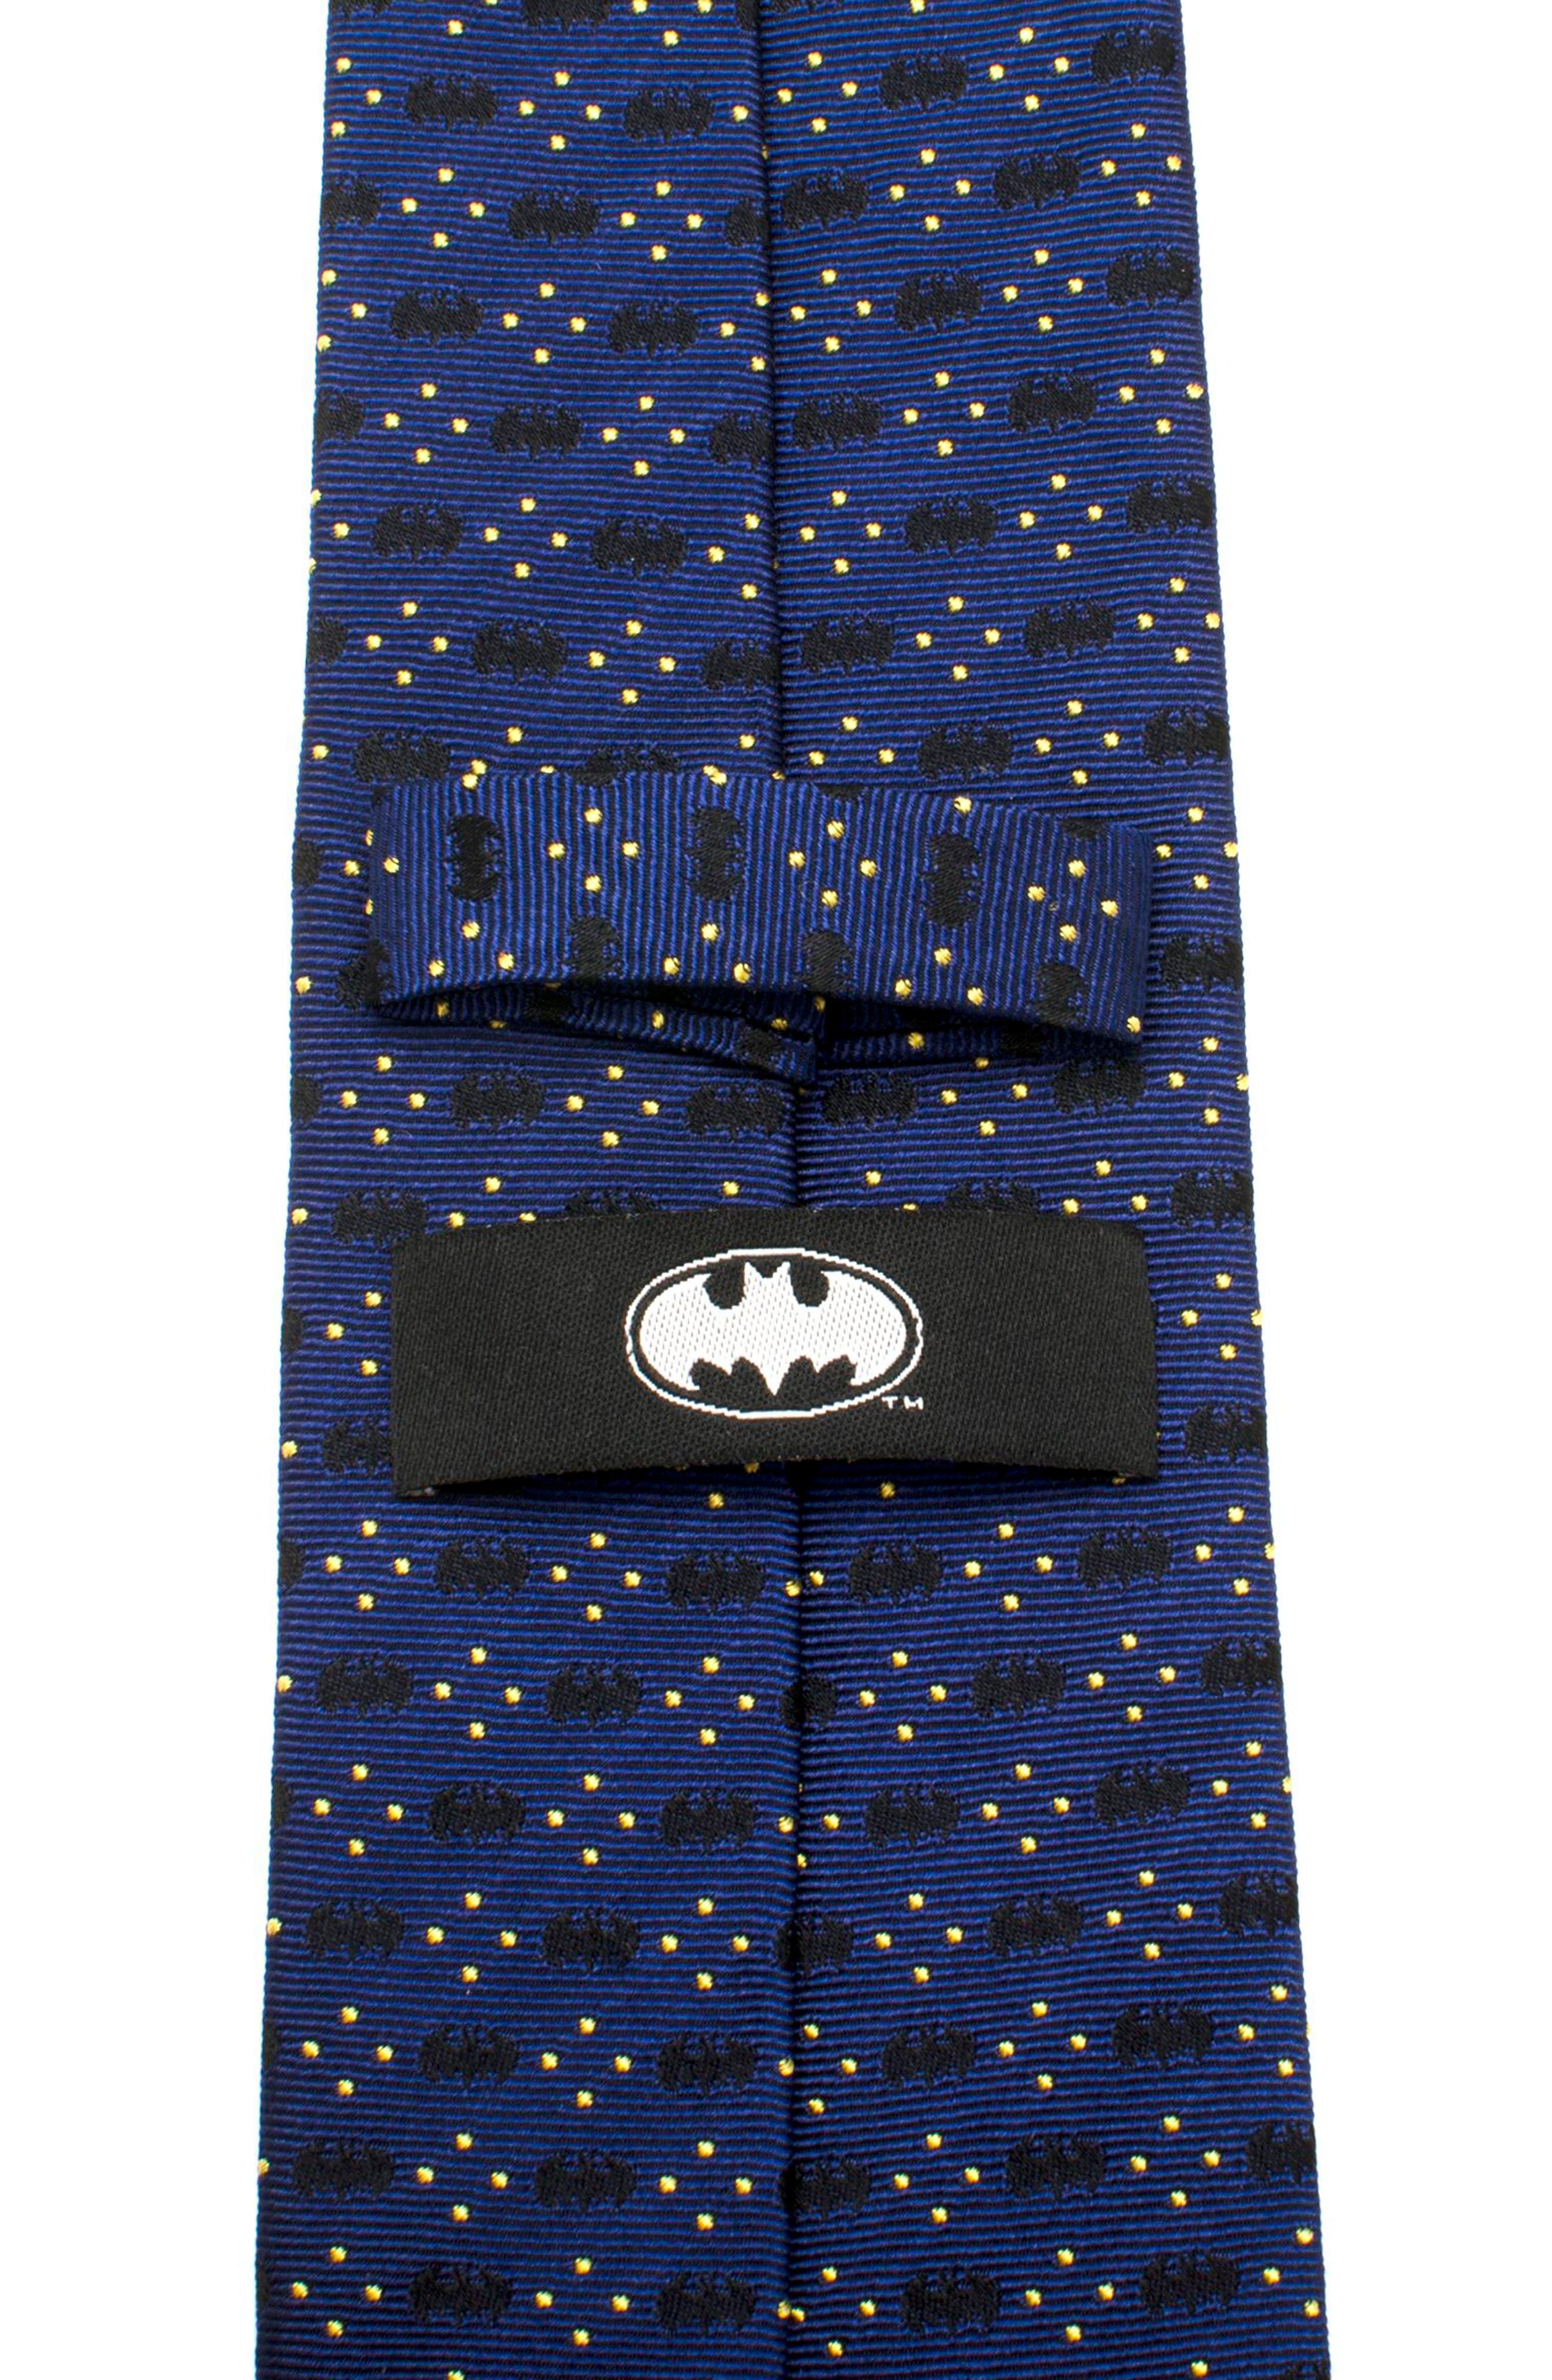 Batman Diamond Dot Silk Tie,                             Alternate thumbnail 4, color,                             410